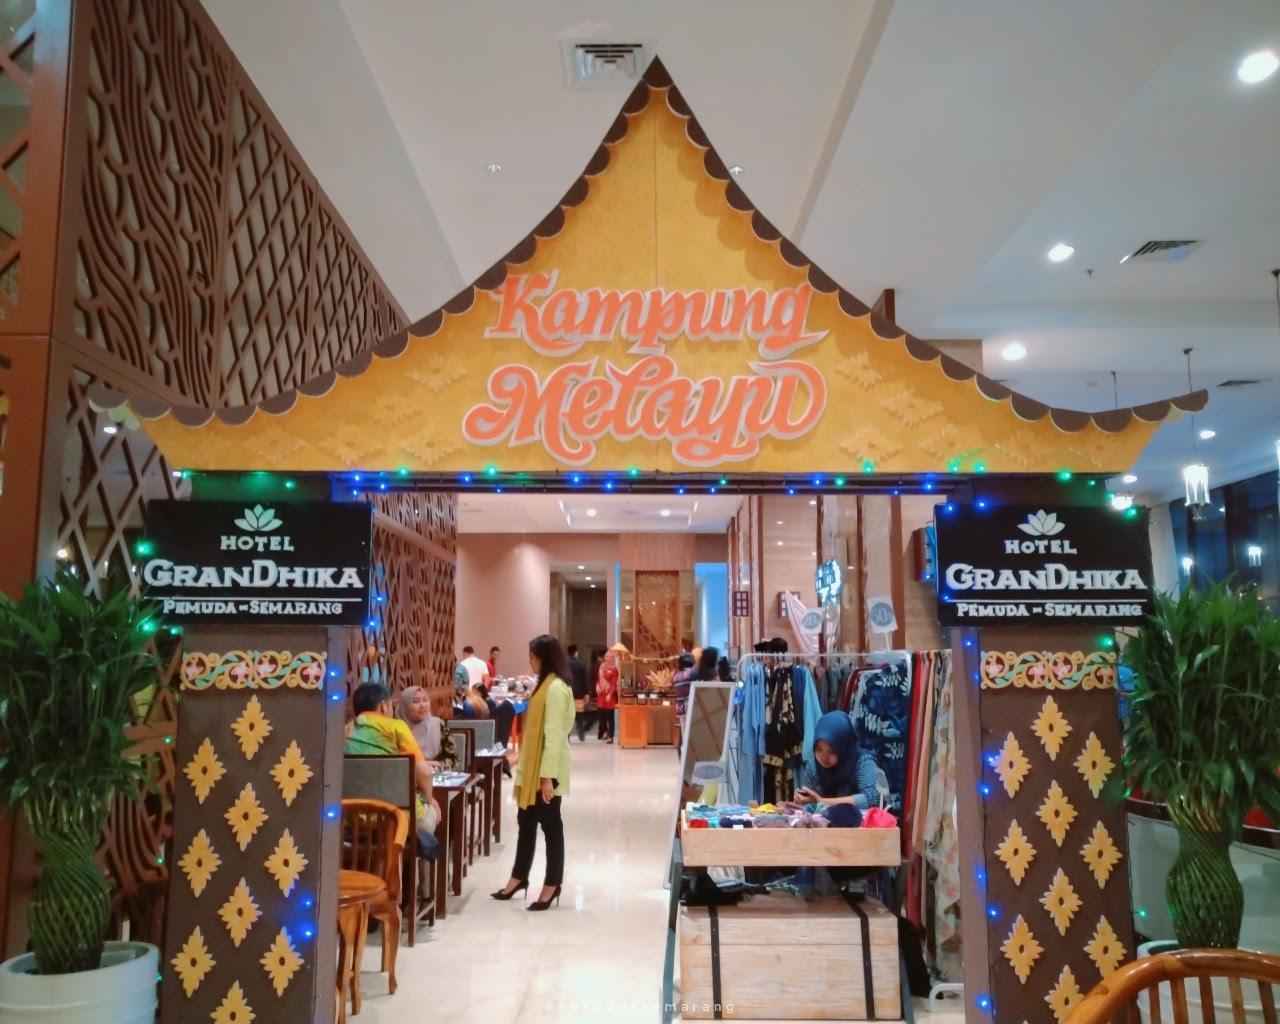 Buka Puasa Bareng Blogger dan Media, Cara Hotel GranDhika Semarang Kenalkan Paket Puasa Bertema Kampung Melayu